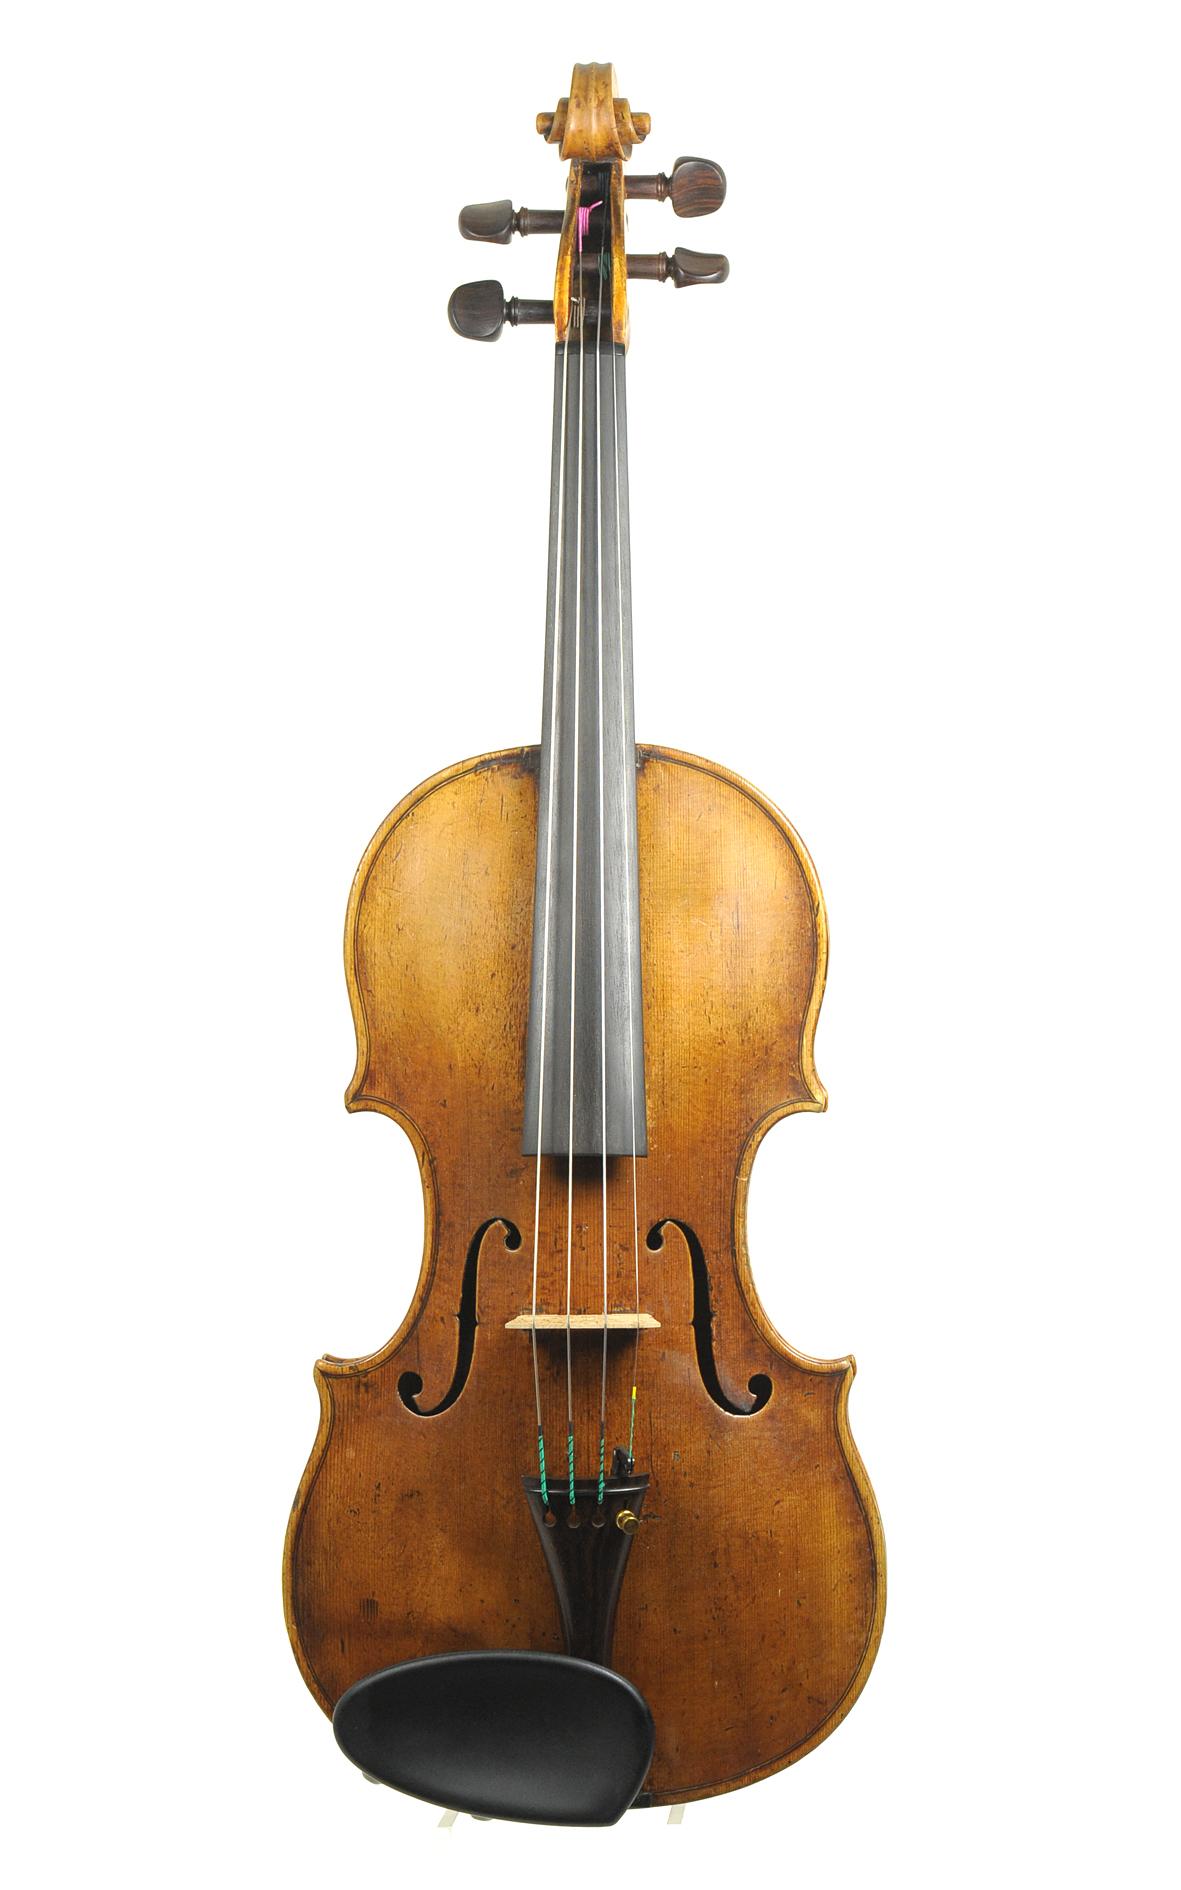 Fine Klotz violin from the Yehudi Menuhin collection